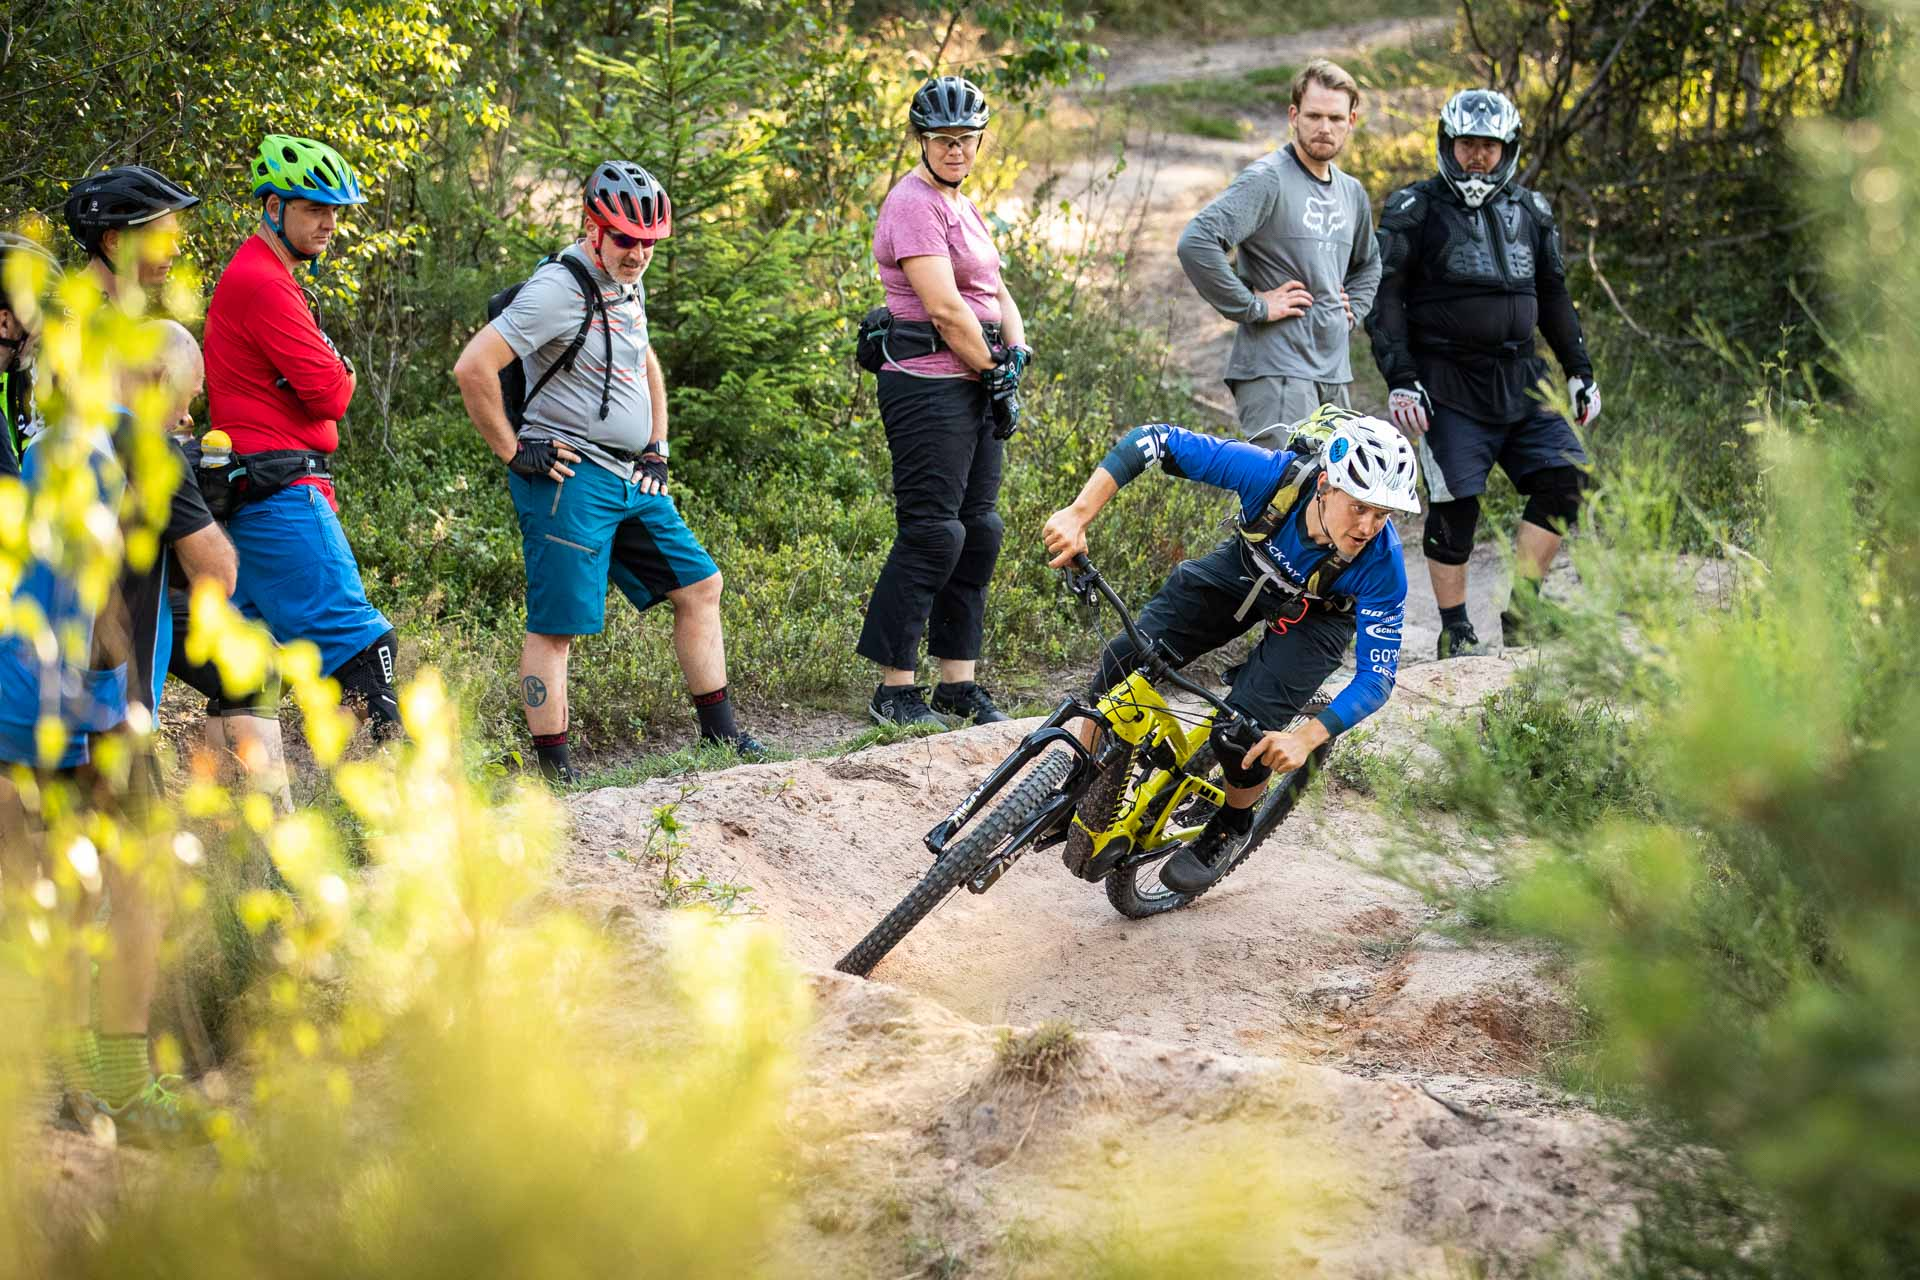 eMTB eBike Fortgeschritten Fahrtechnik Kurs in Siegen - Rock my Trail Bikeschule37